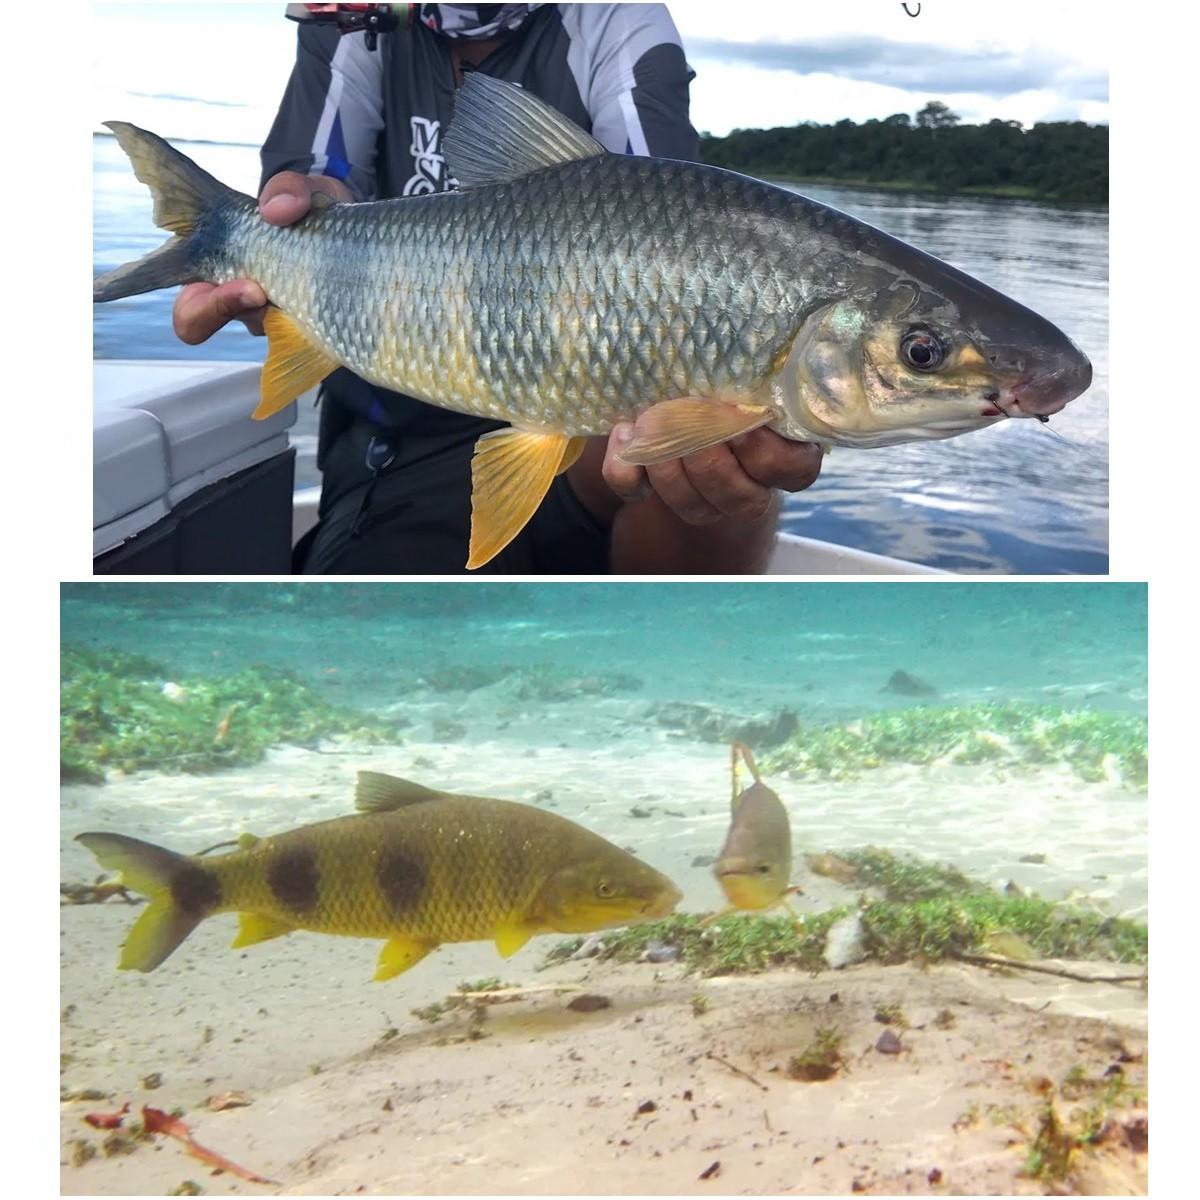 Kit De Pesca Completo Barato 2 Vara 2 Molinete Com Itens